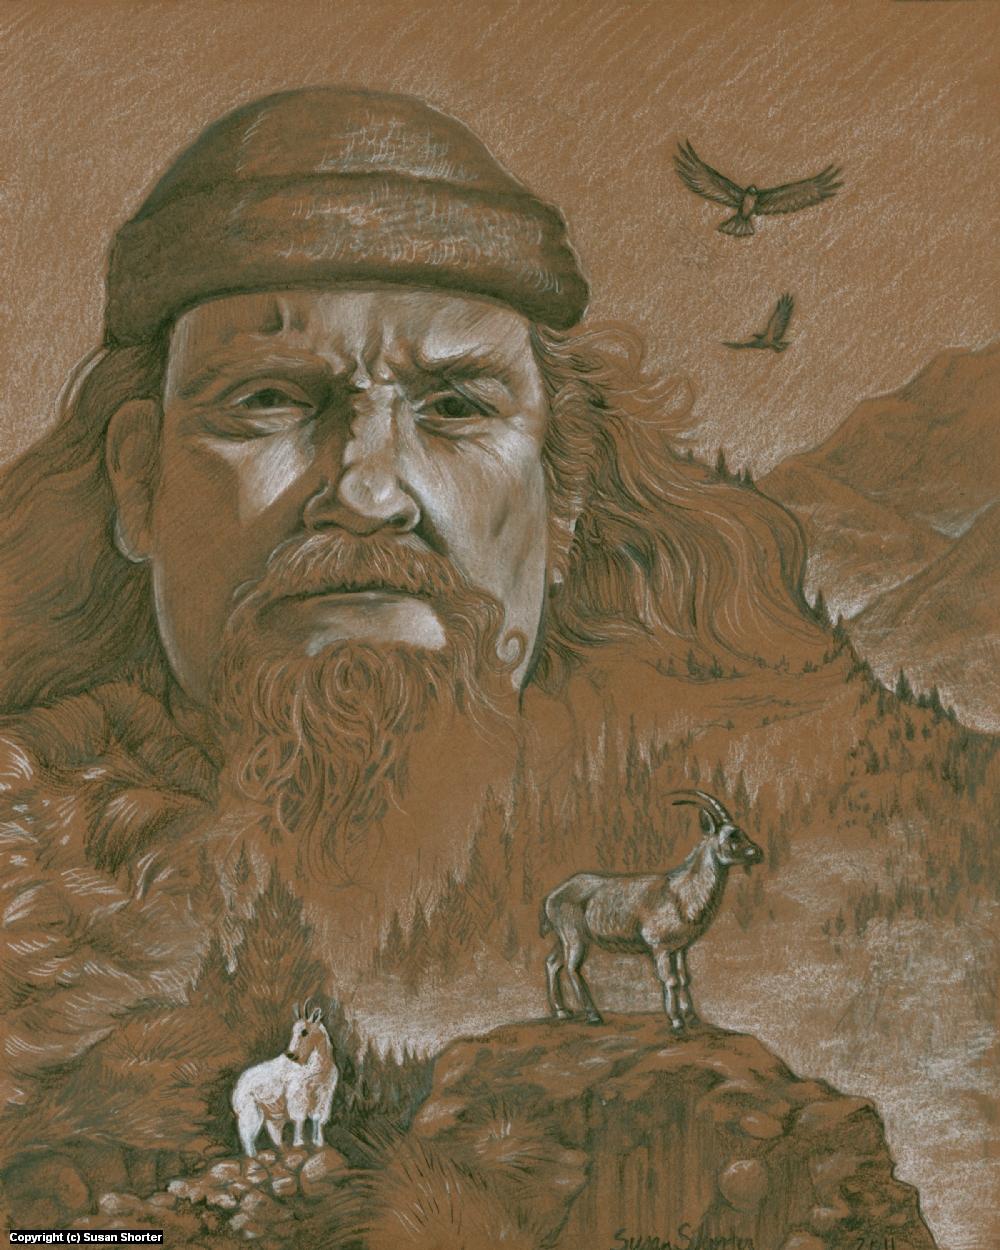 Mountain Man Artwork by Susan Shorter